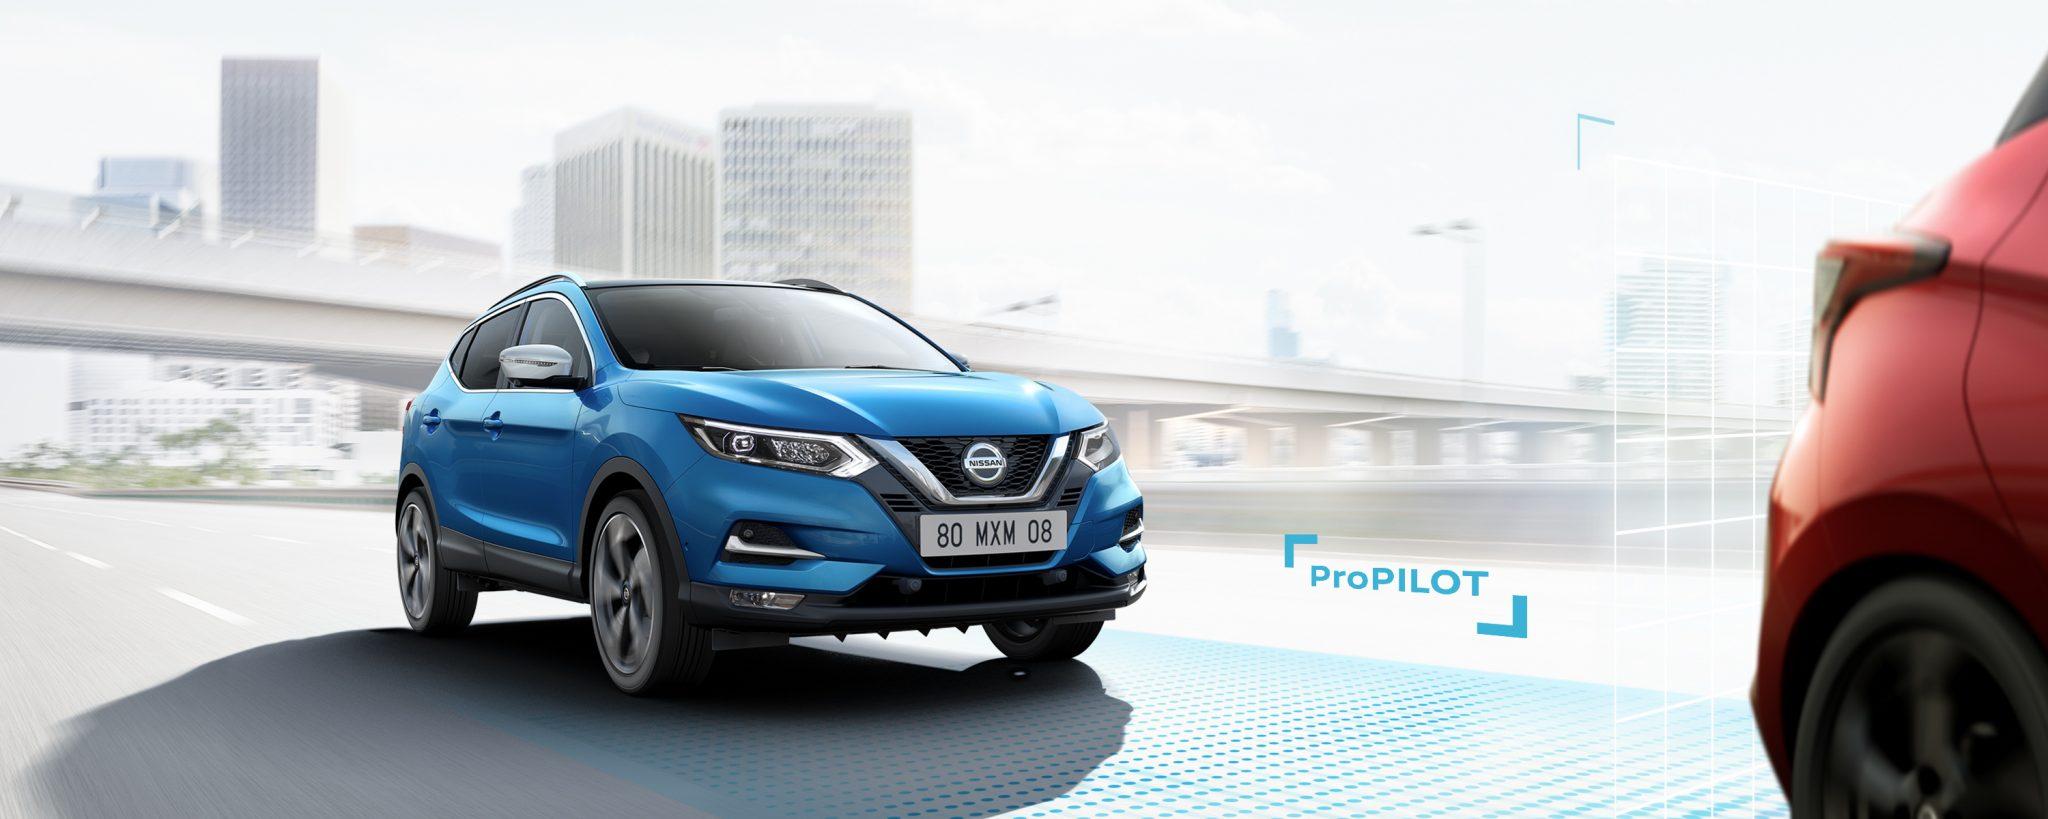 Nissan Qashqai 2017 N-Drive ProPilot Frontansicht Blau City